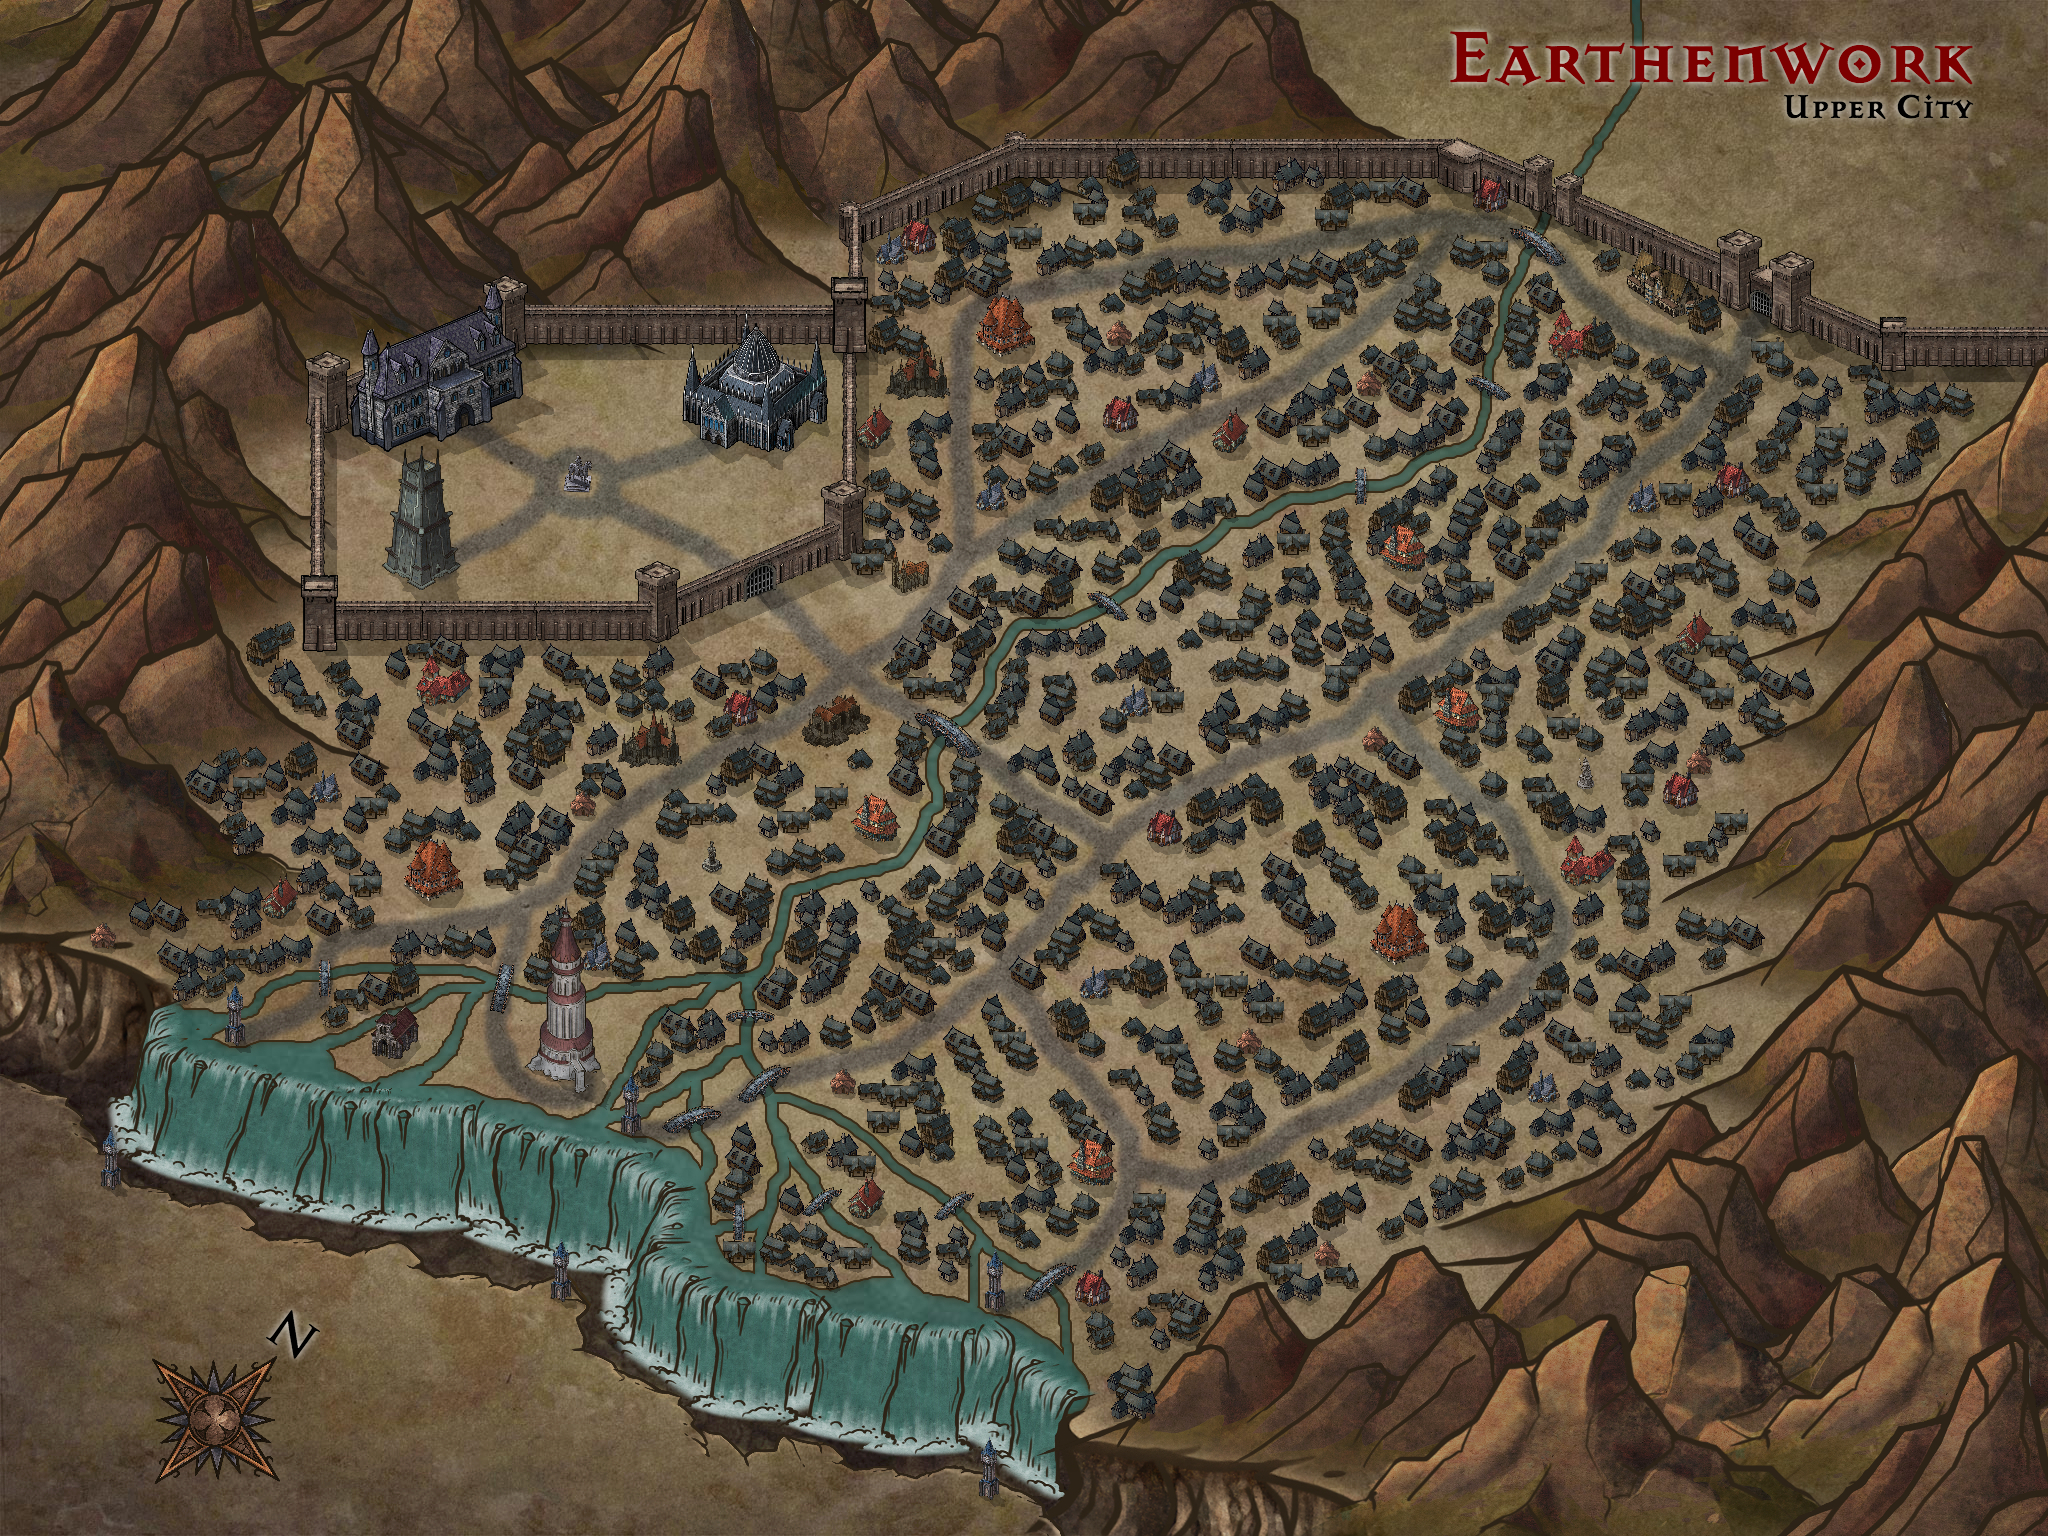 Map_of_Upper_Earthenwork.jpg